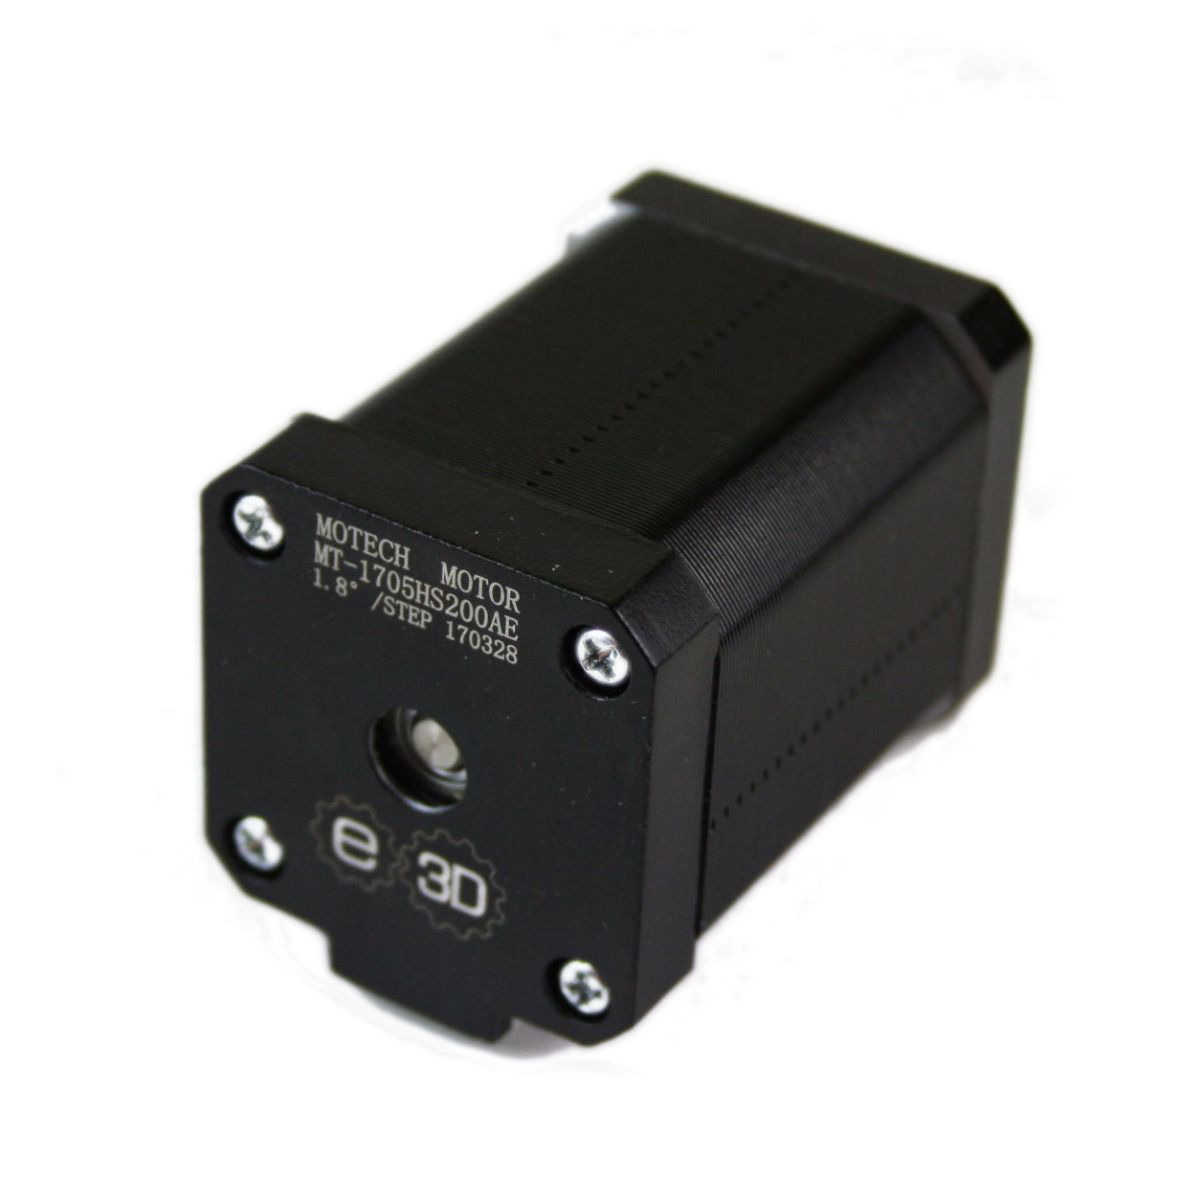 E3D NEMA17 Super Whopper Stepper Motor - 3D Printer Spare Parts